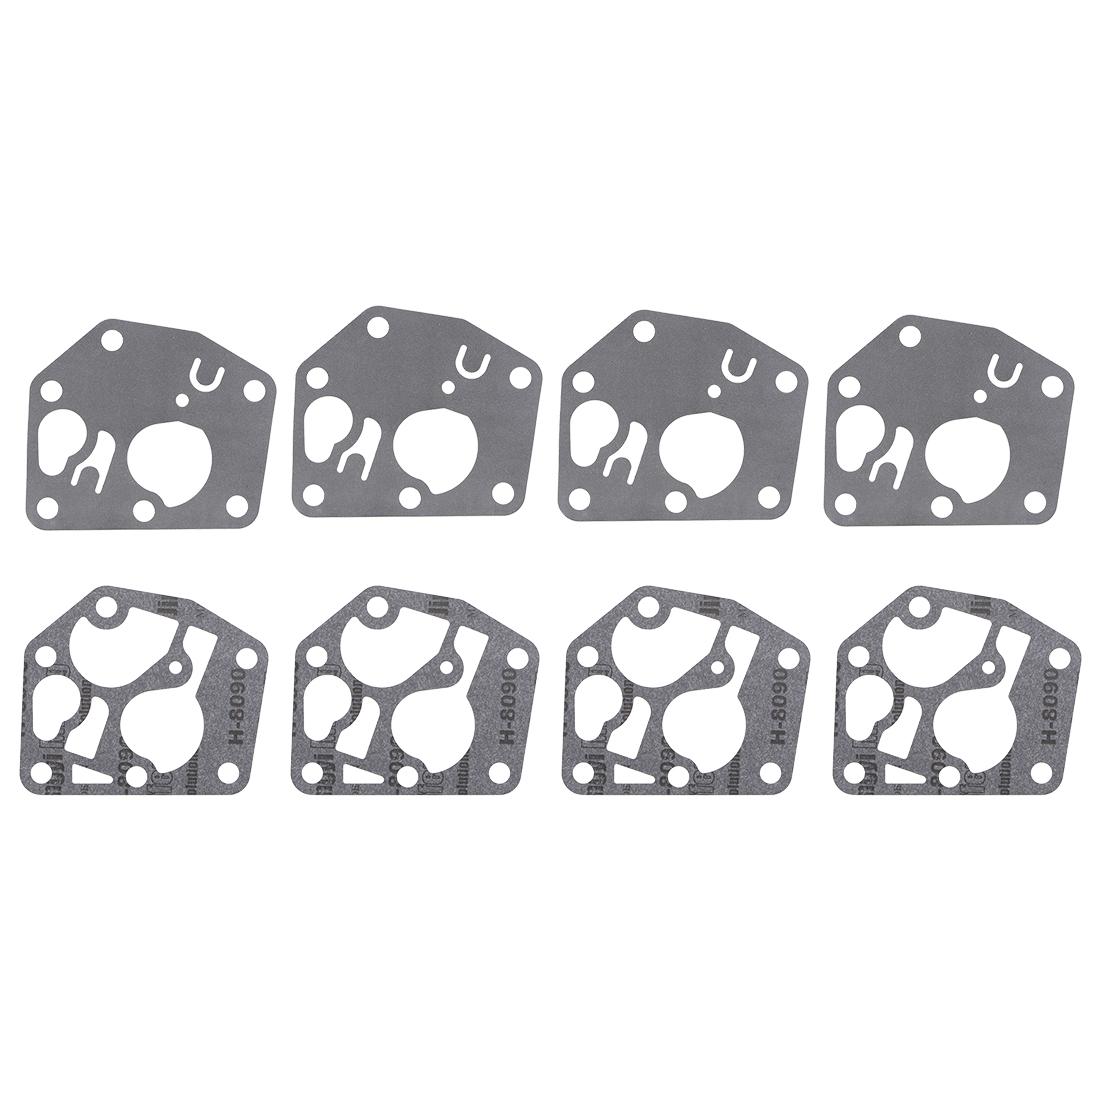 495770 Carburetor Rebuild Kit for Briggs Stratton 495770 795083 95900 96900 4pcs